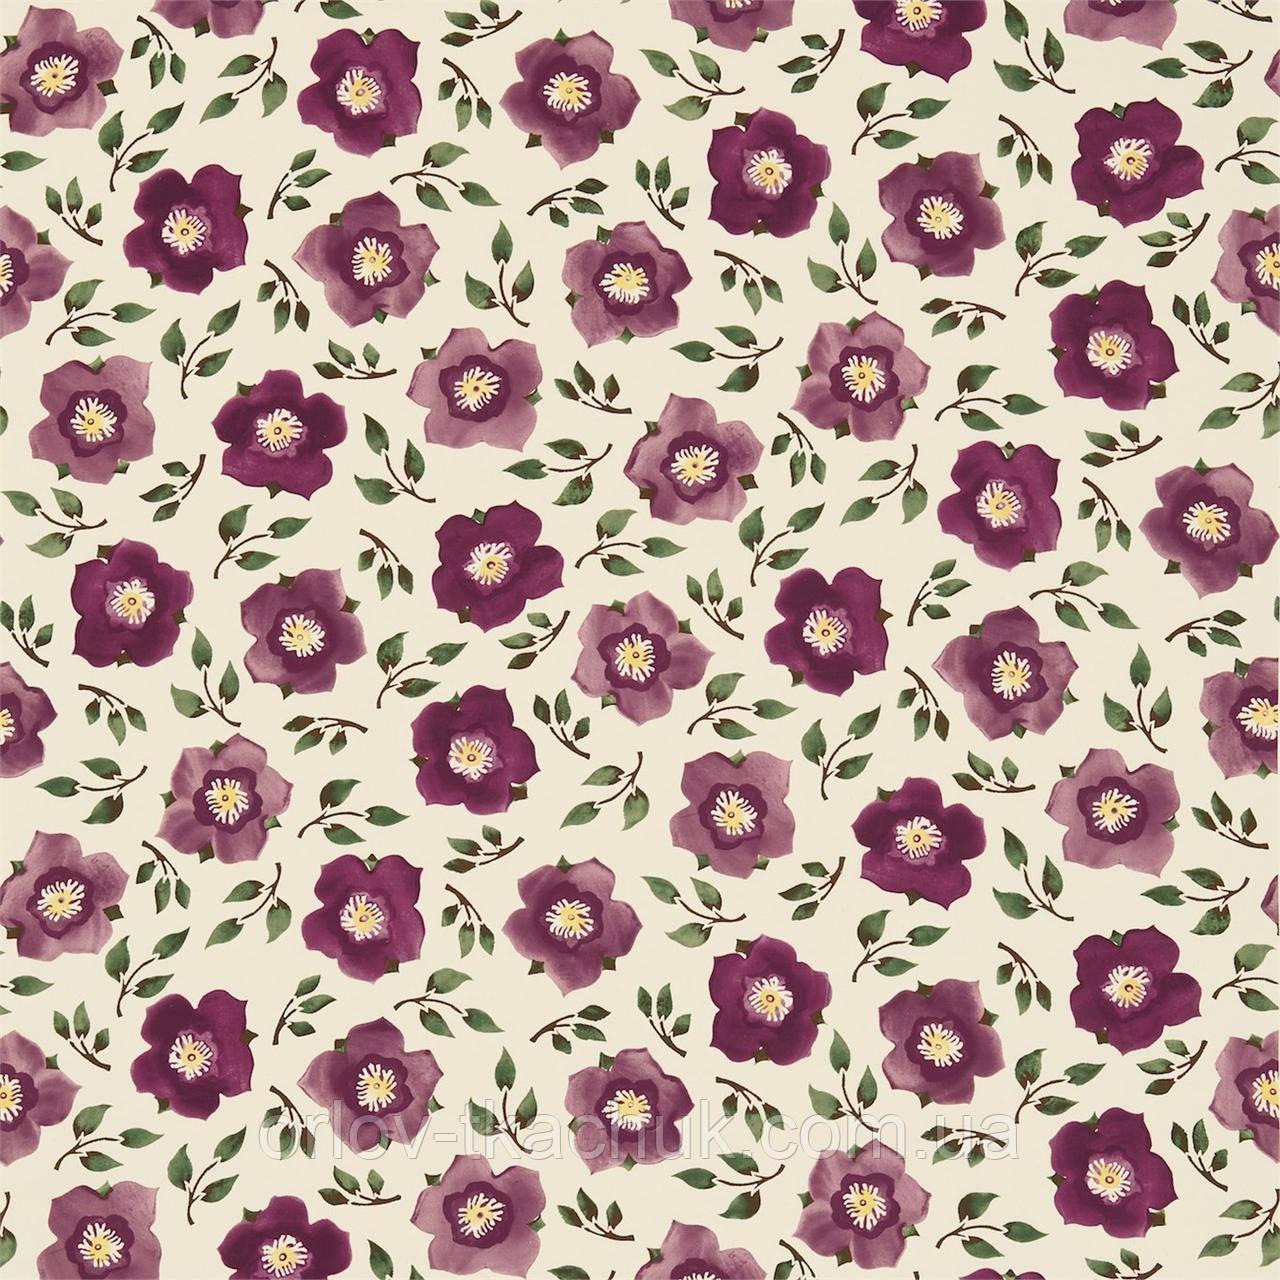 Ткань интерьерная Hellebore China Emma Bridgewater Sanderson